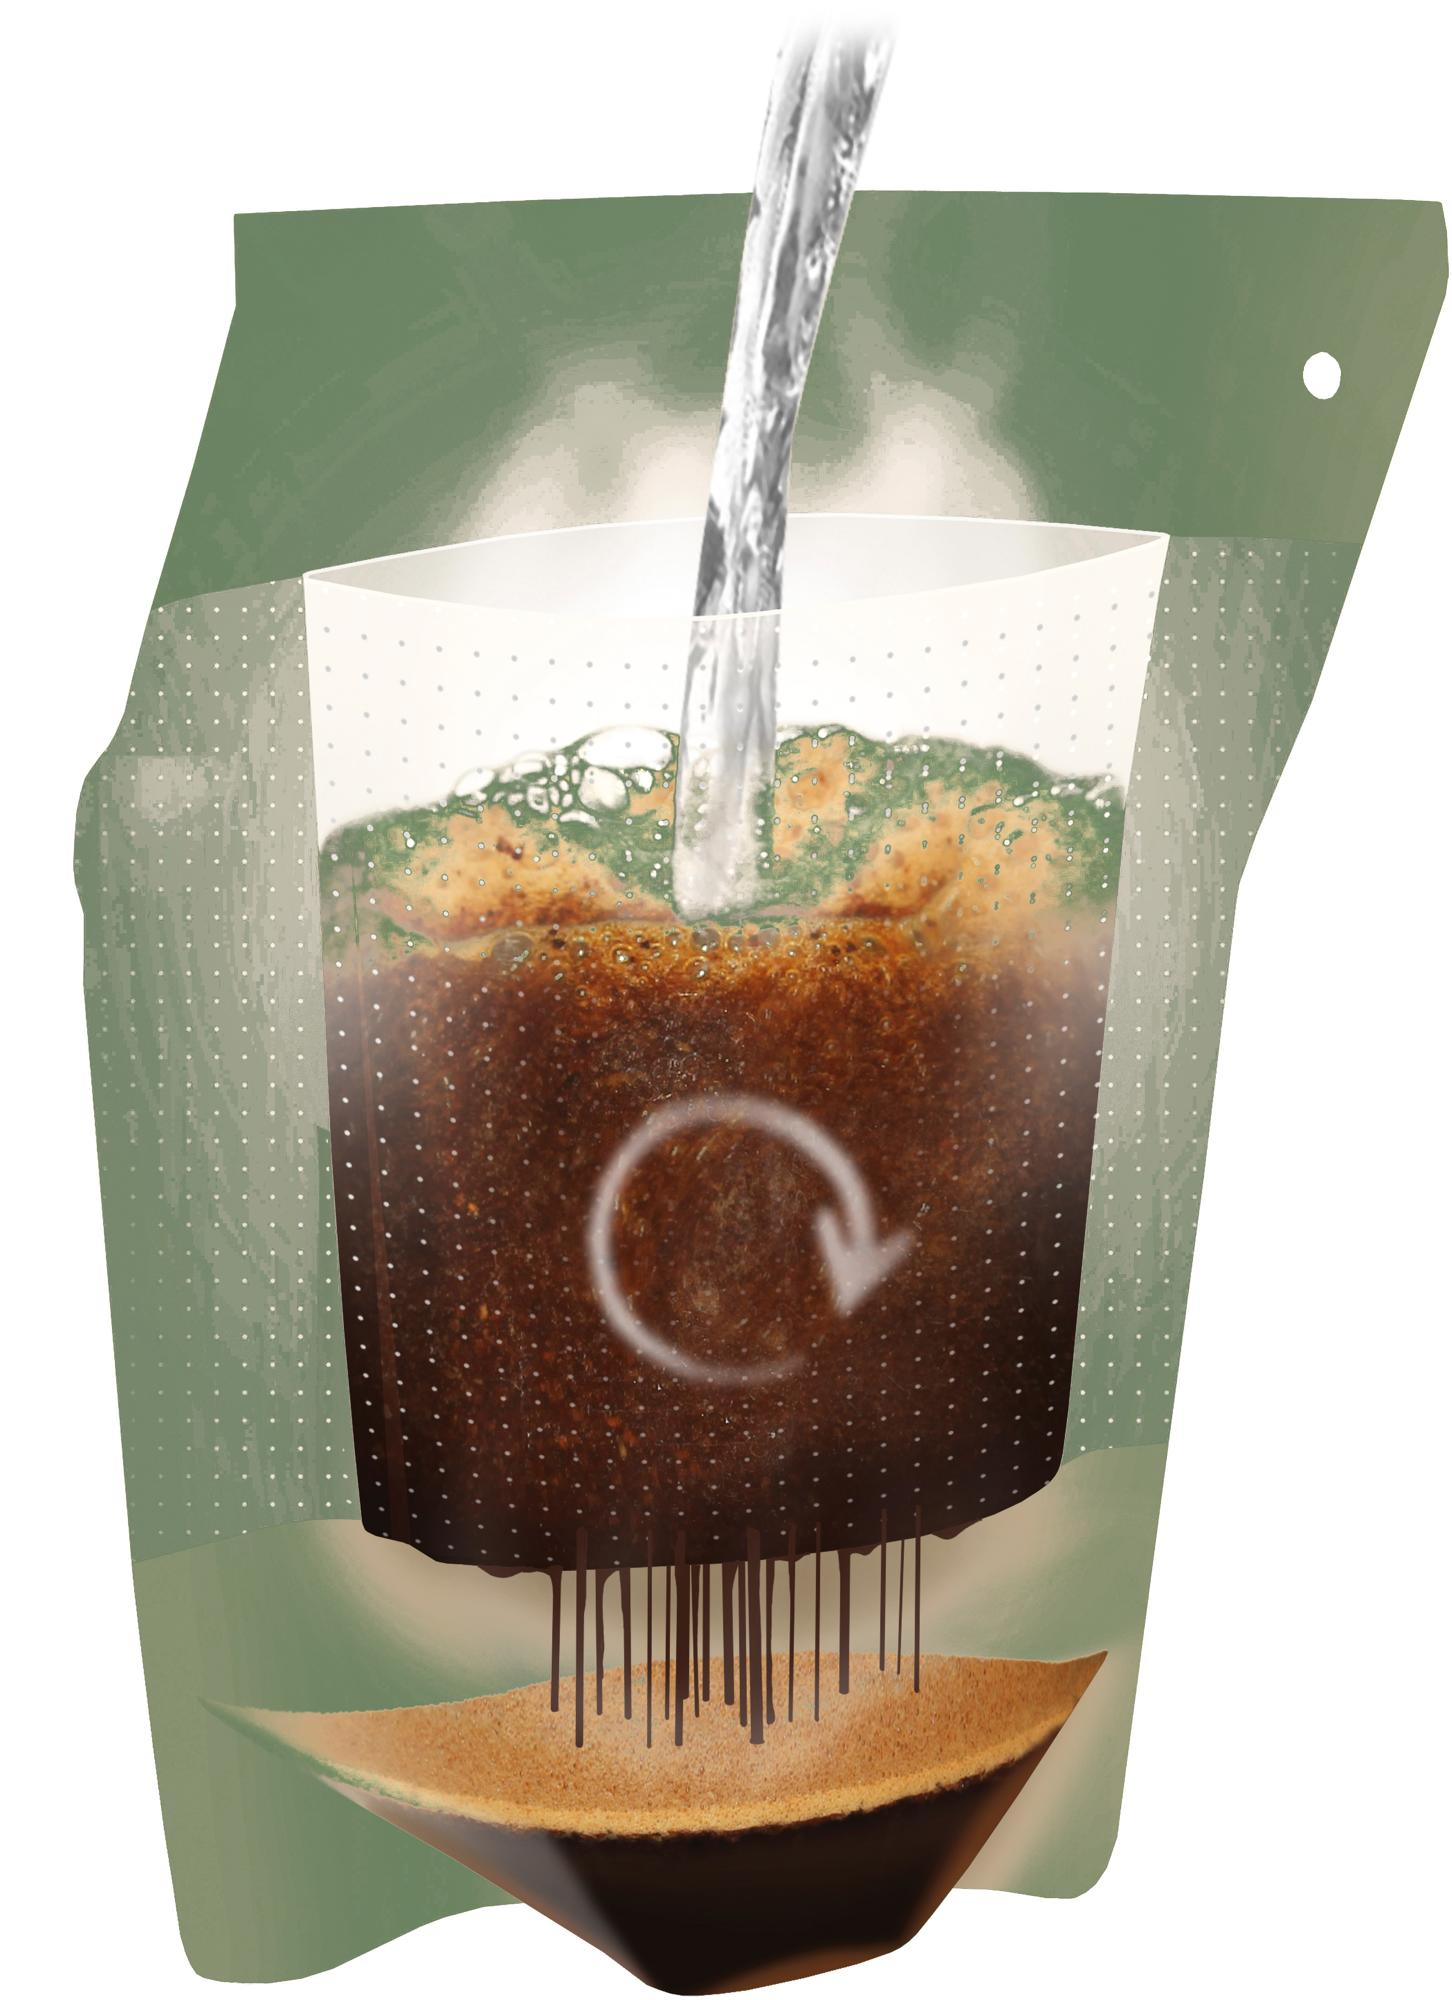 Growers Cup Coffee Brewer Kaffee Brazil 2 Tassen Von Growers Cup